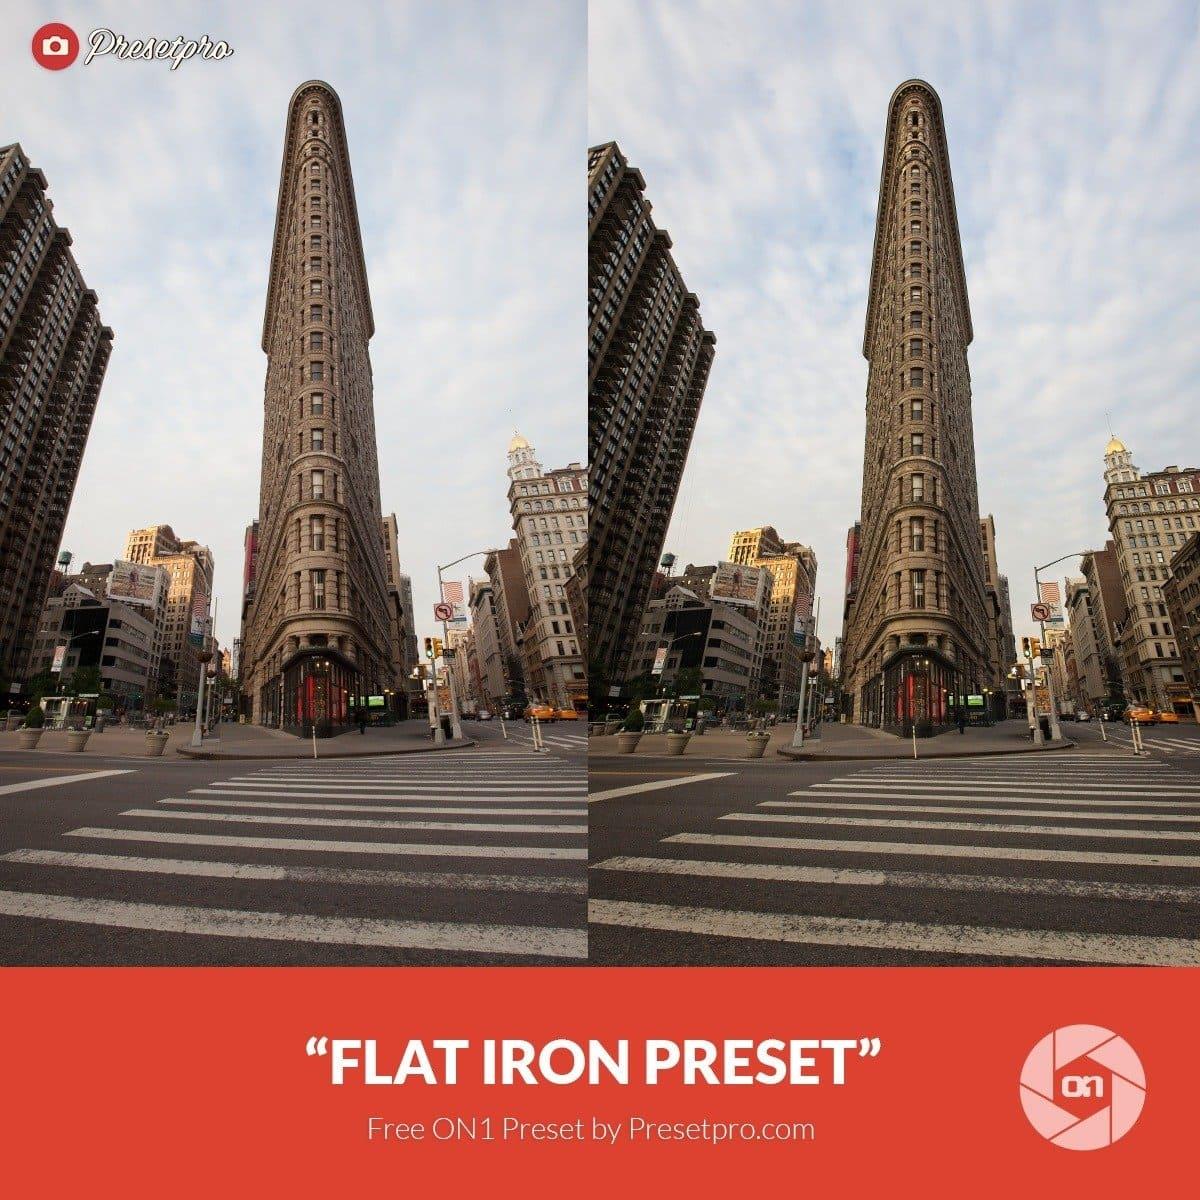 Free-On1-Preset-Flat-Iron-Presetpro.com